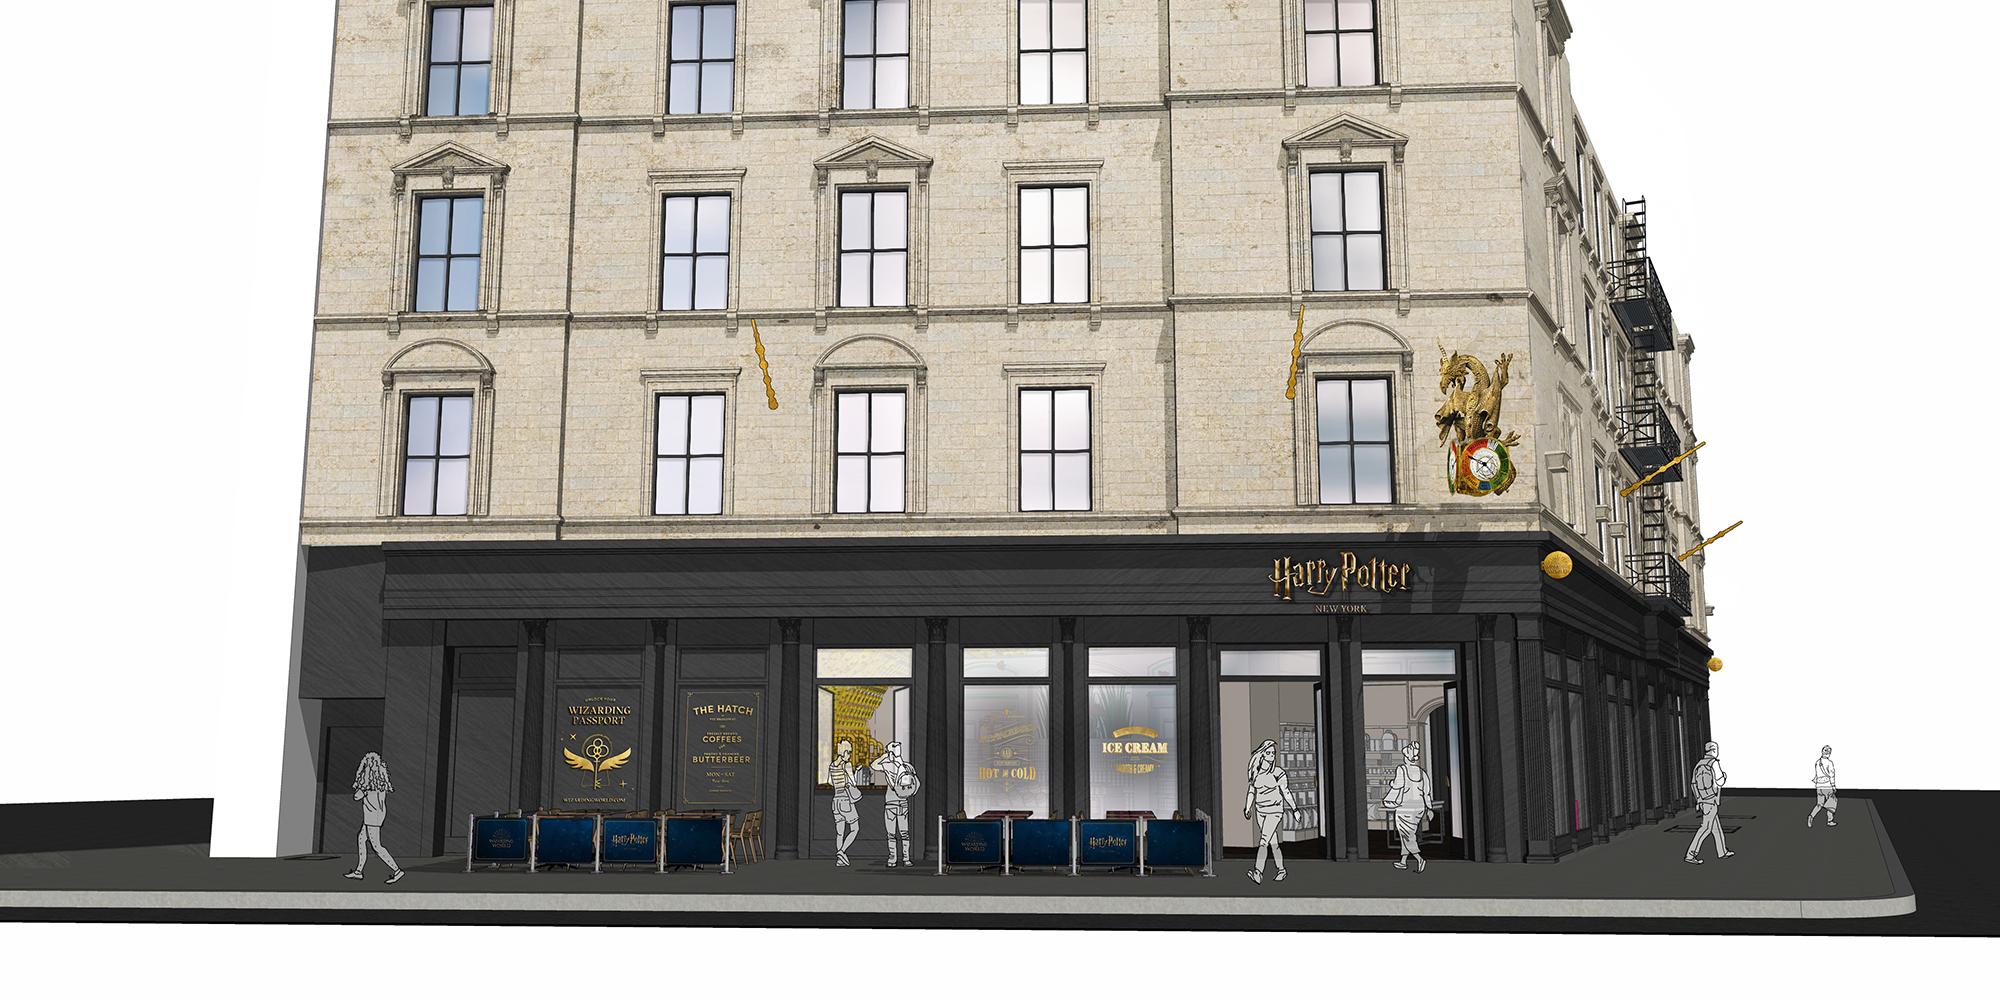 harry_potter_new_york_flagship_-_concept_2_5e1b4b74154b3.jpg